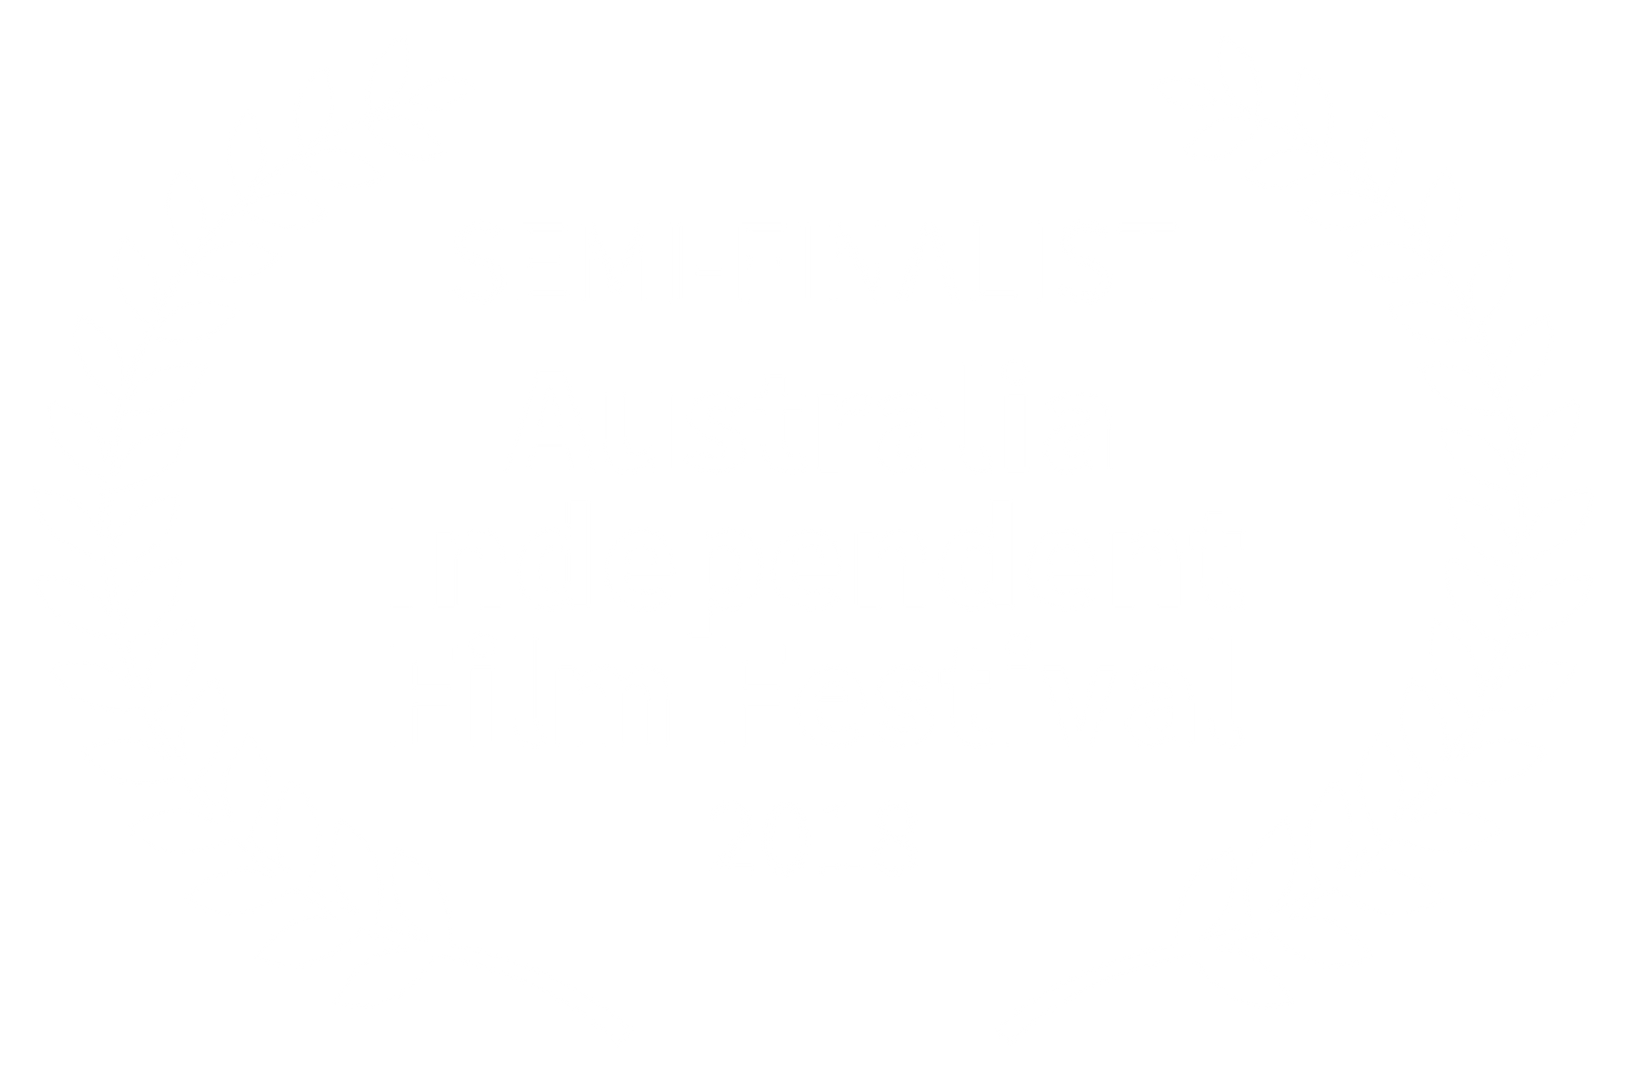 SEMI-FINALIST - Australia Independent Fi